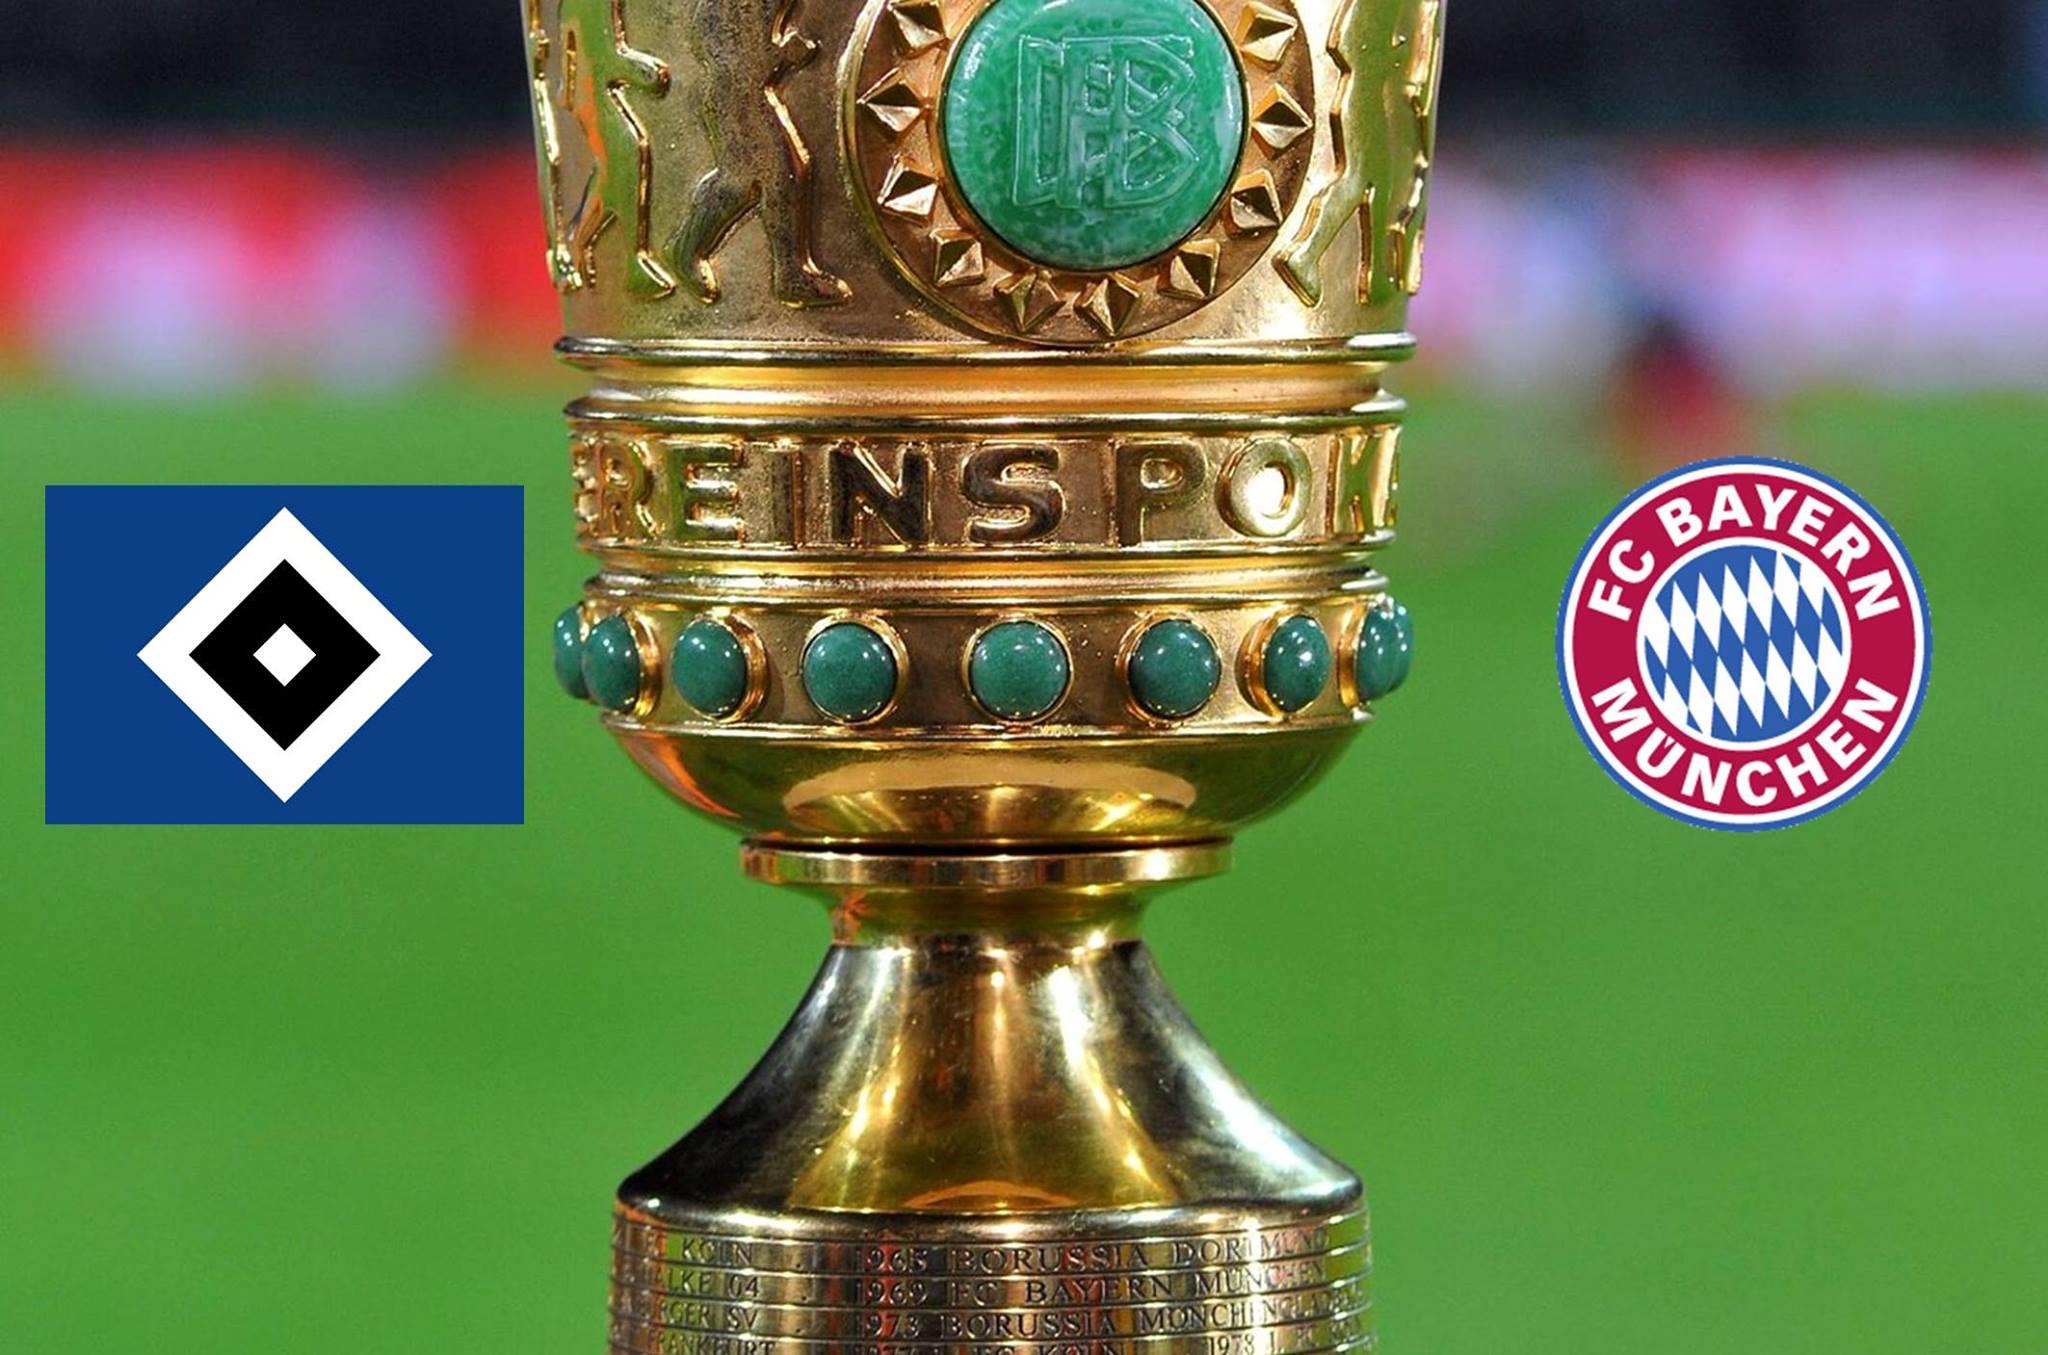 Auslosung 2. Runde Dfb Pokal